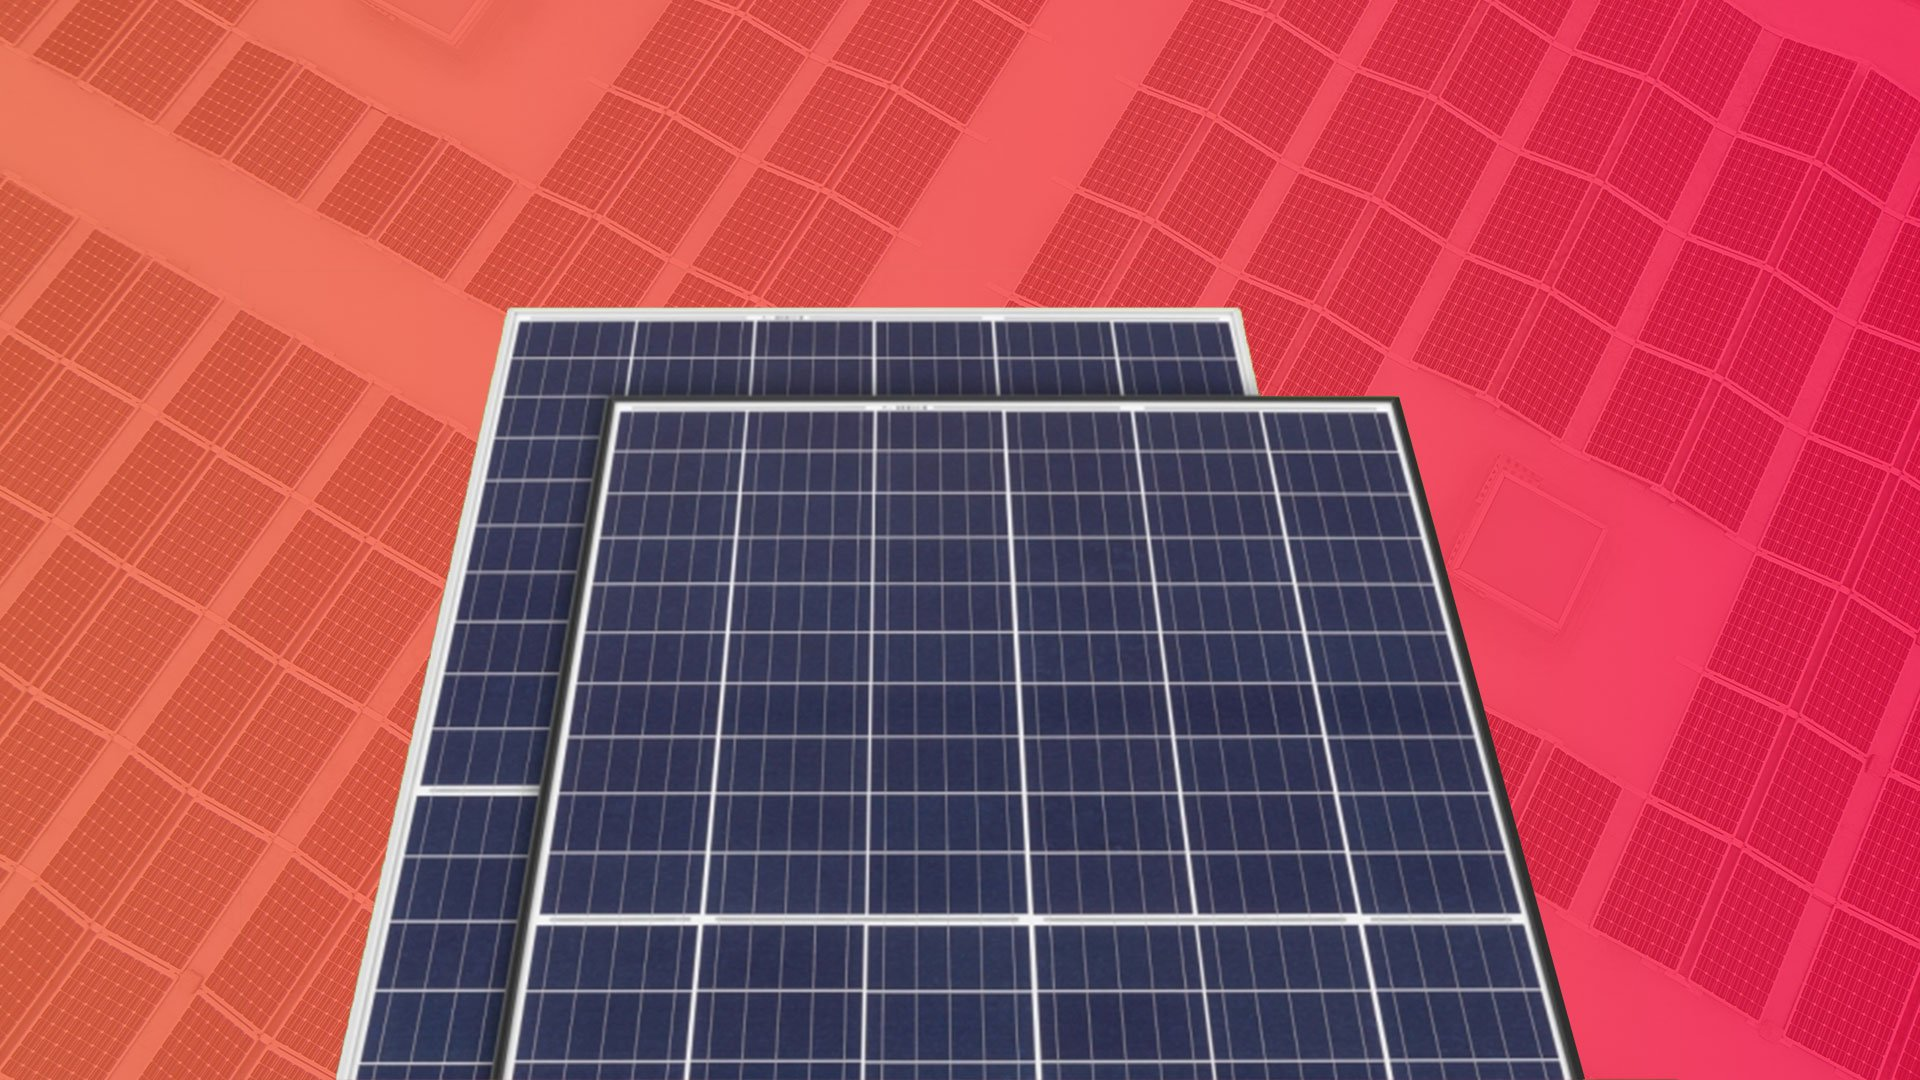 Sale 3 Phase Solar Deals Perth Solar Warehouse